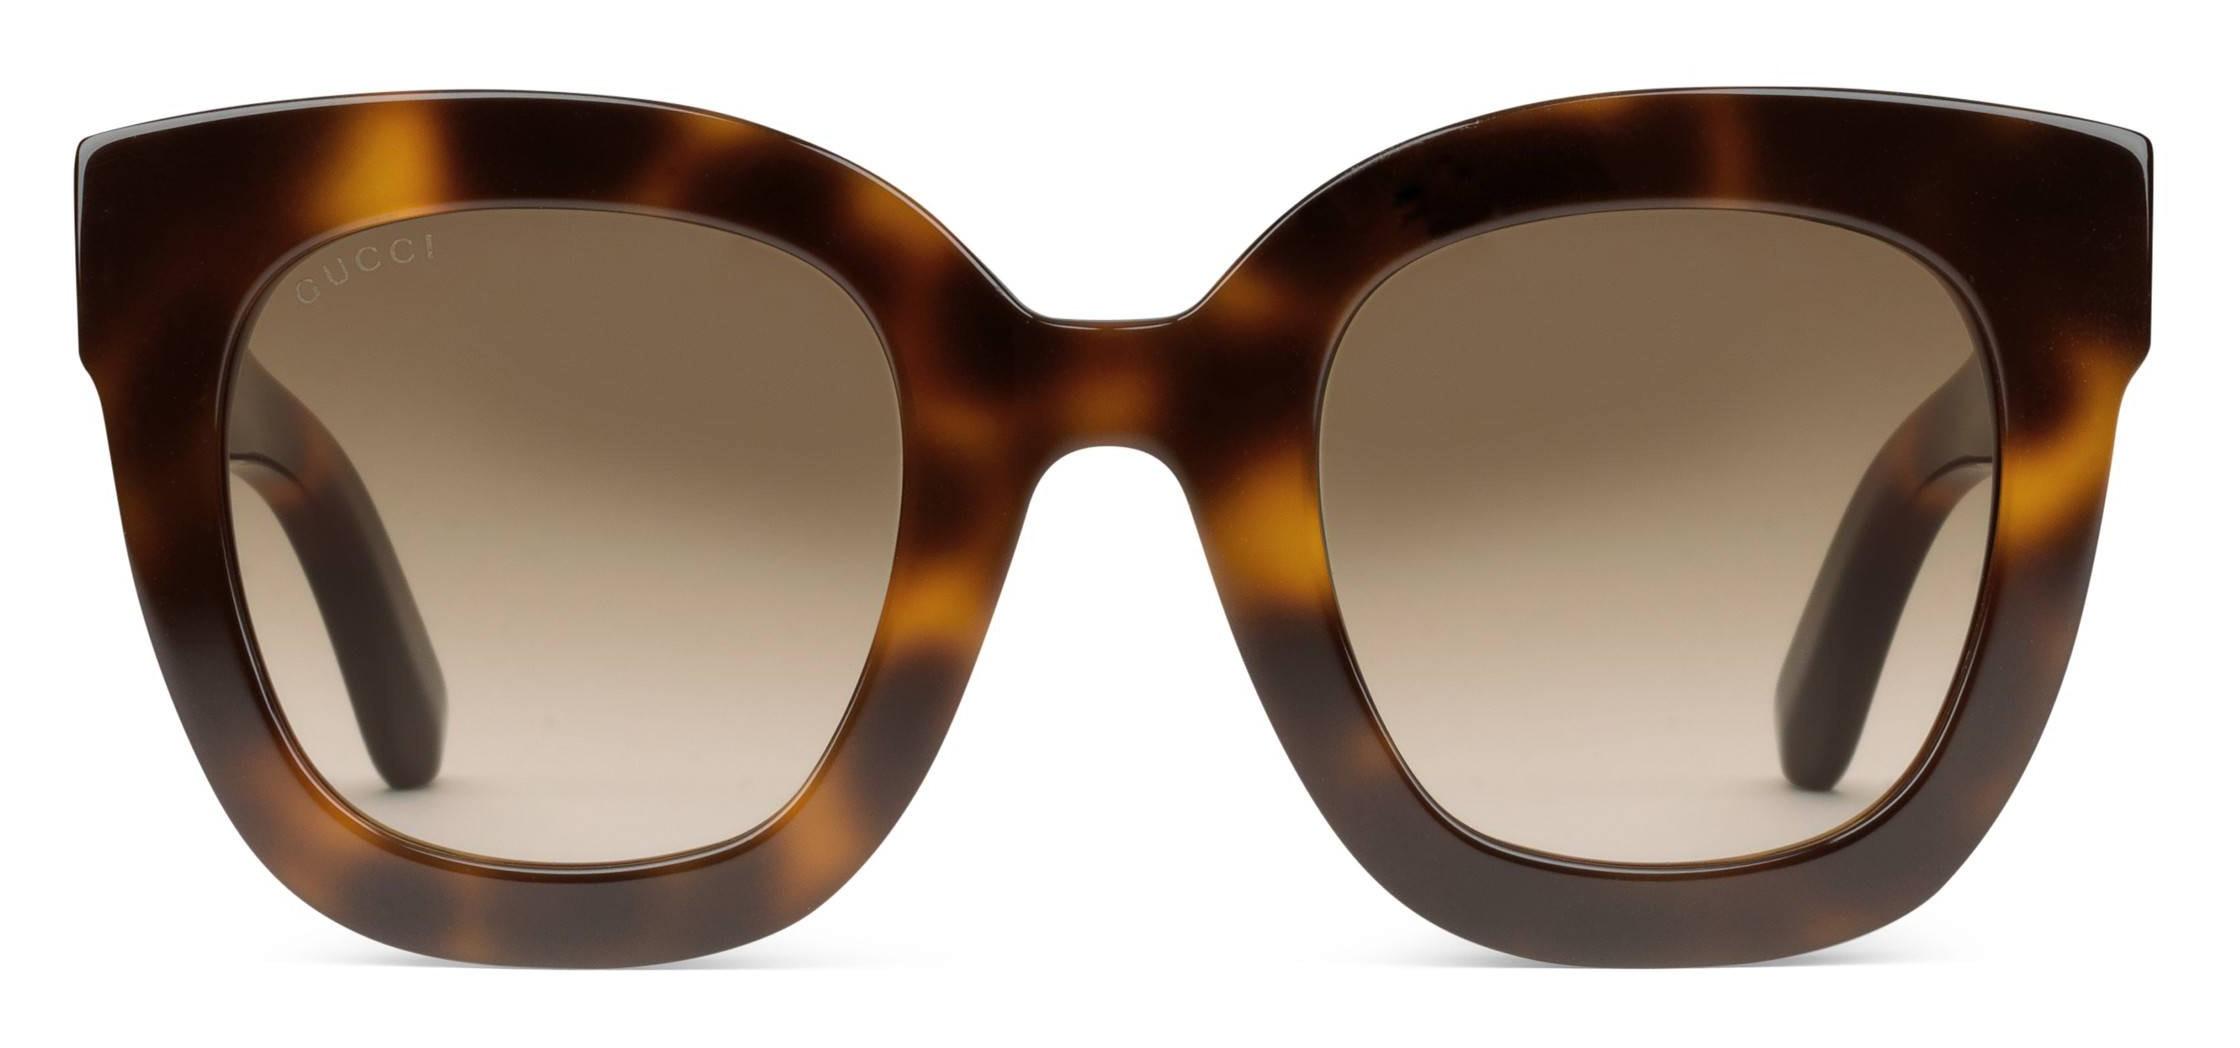 5fa5ff1c8dd Gucci - Round Frame Acetate Sunglasses with Star - Tortoiseshell Acetate - Gucci  Eyewear - Avvenice